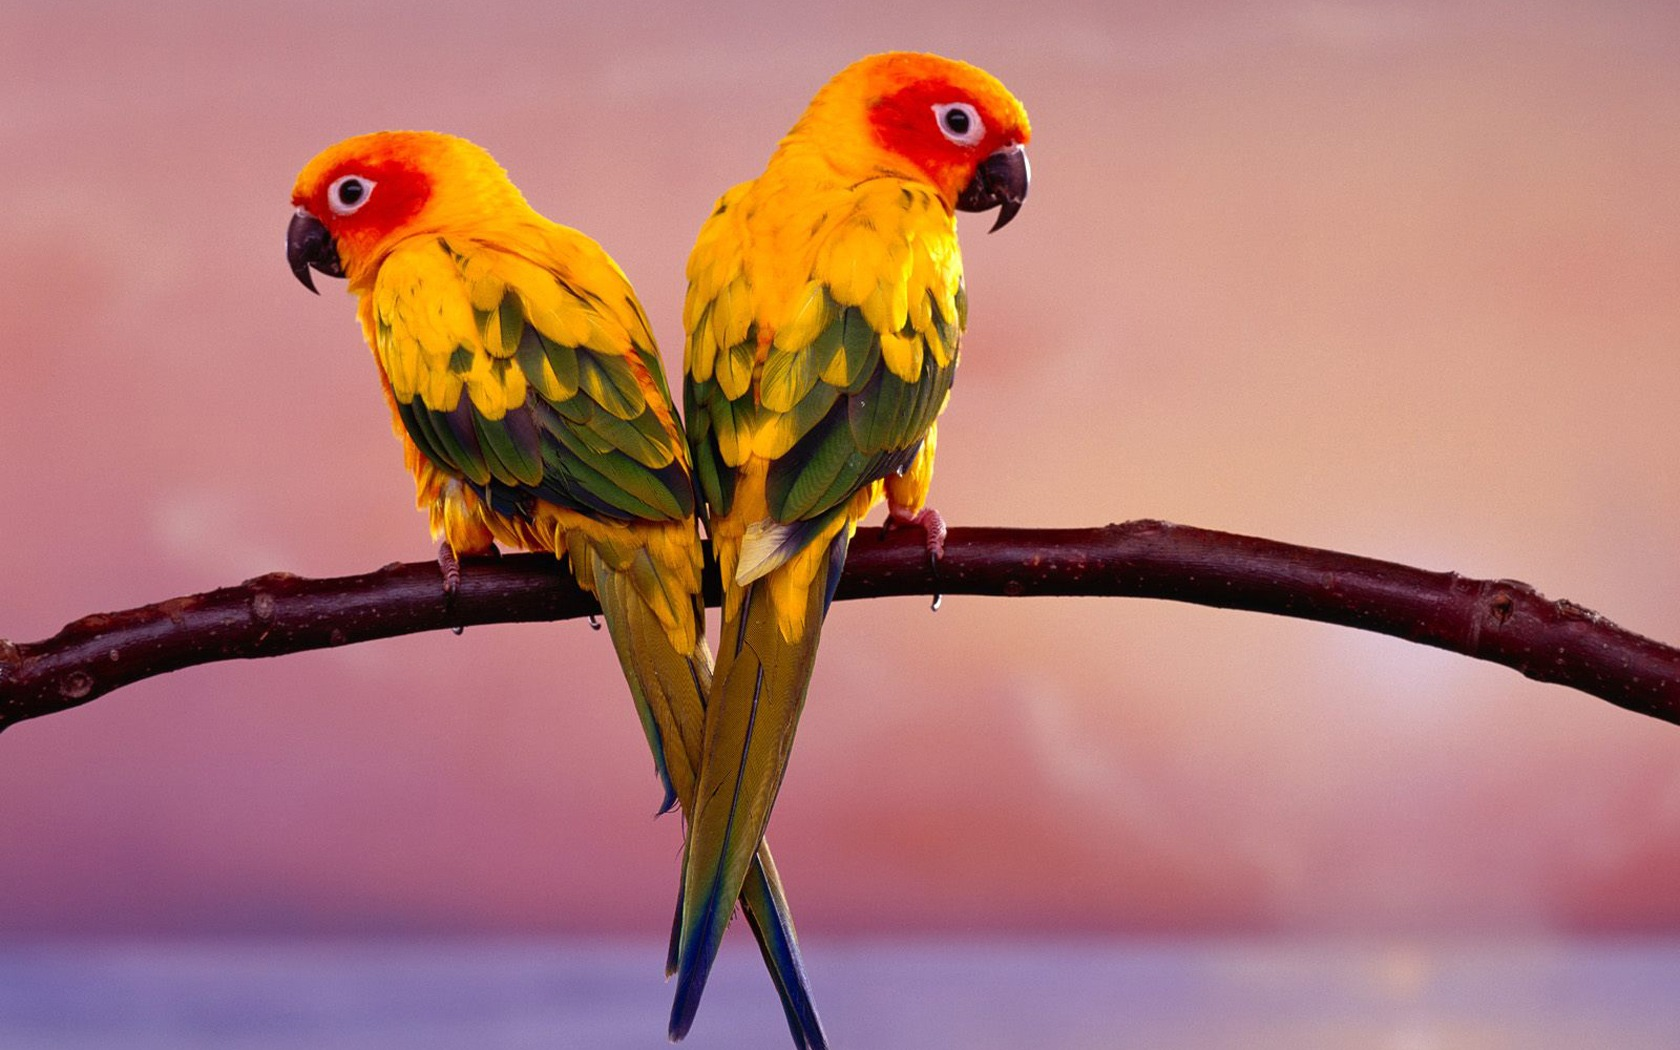 Cool Wallpaper Love Parrot - sun_conure_parrots_wallpaper_parrots_animals_515  Gallery_736617.jpg